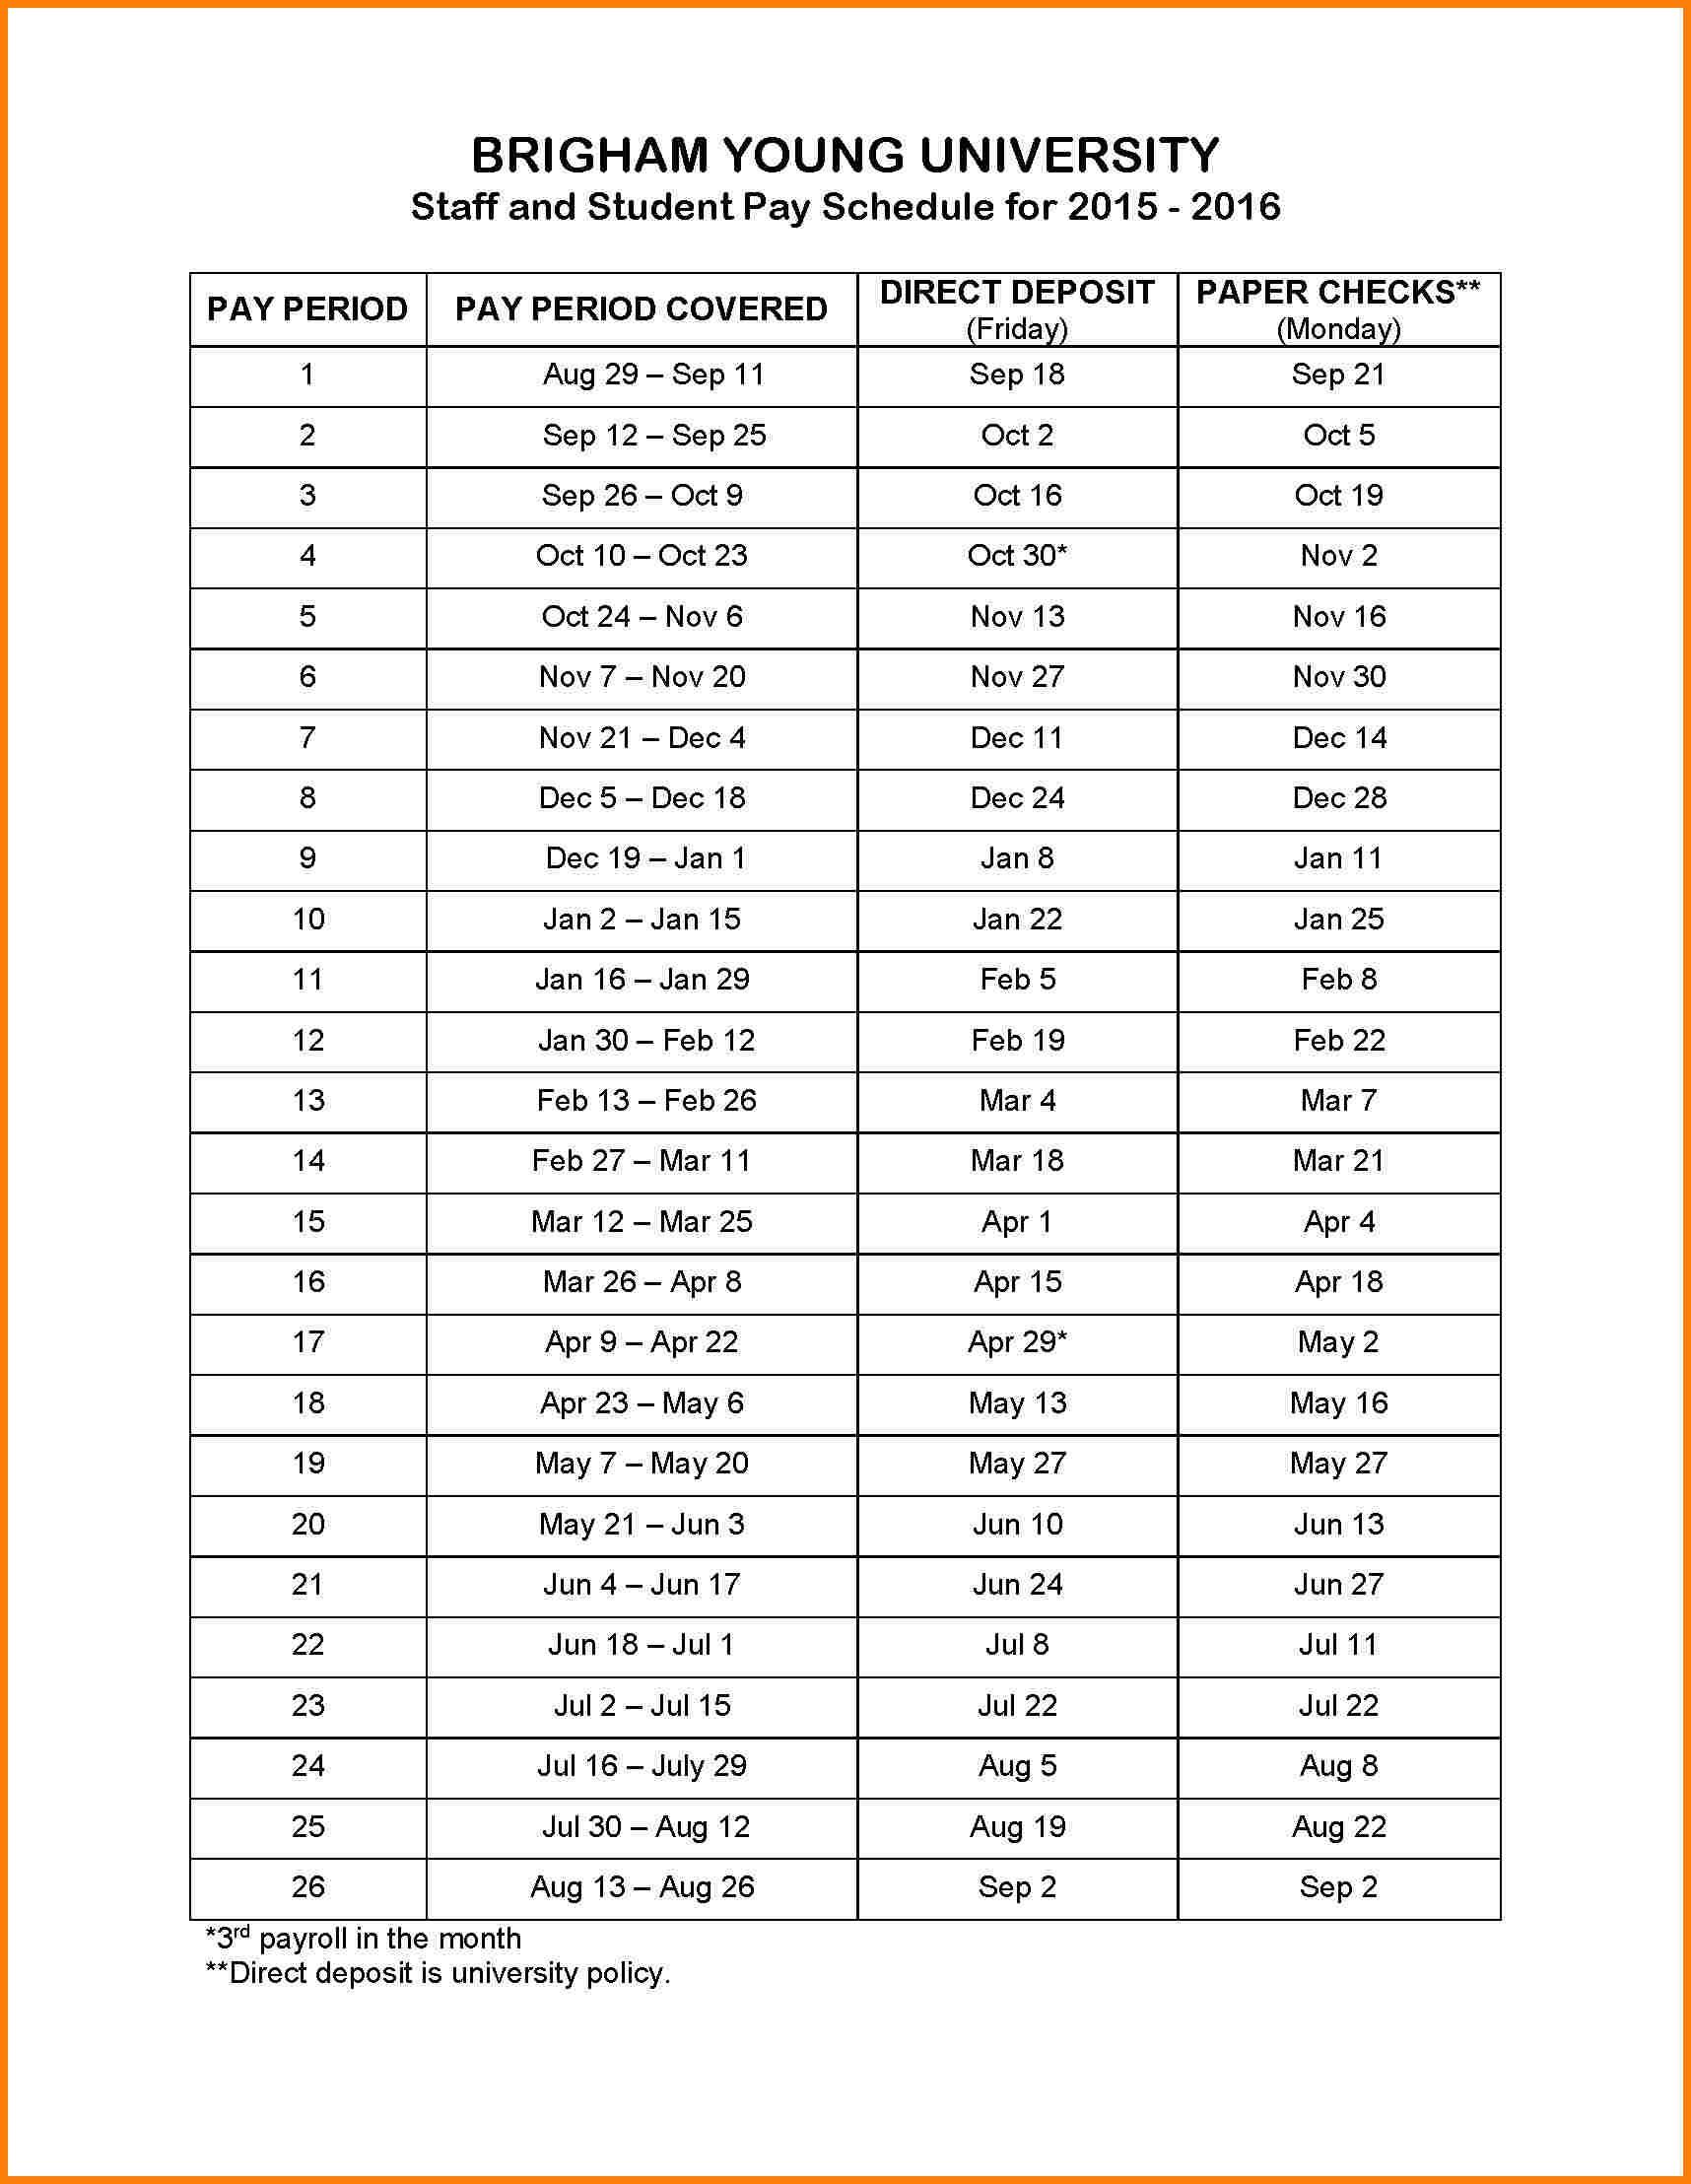 Biweekly Payroll Calendar 2015 Template Biweekly Pay Schedule pertaining to Biweekly Payroll Calendar Template